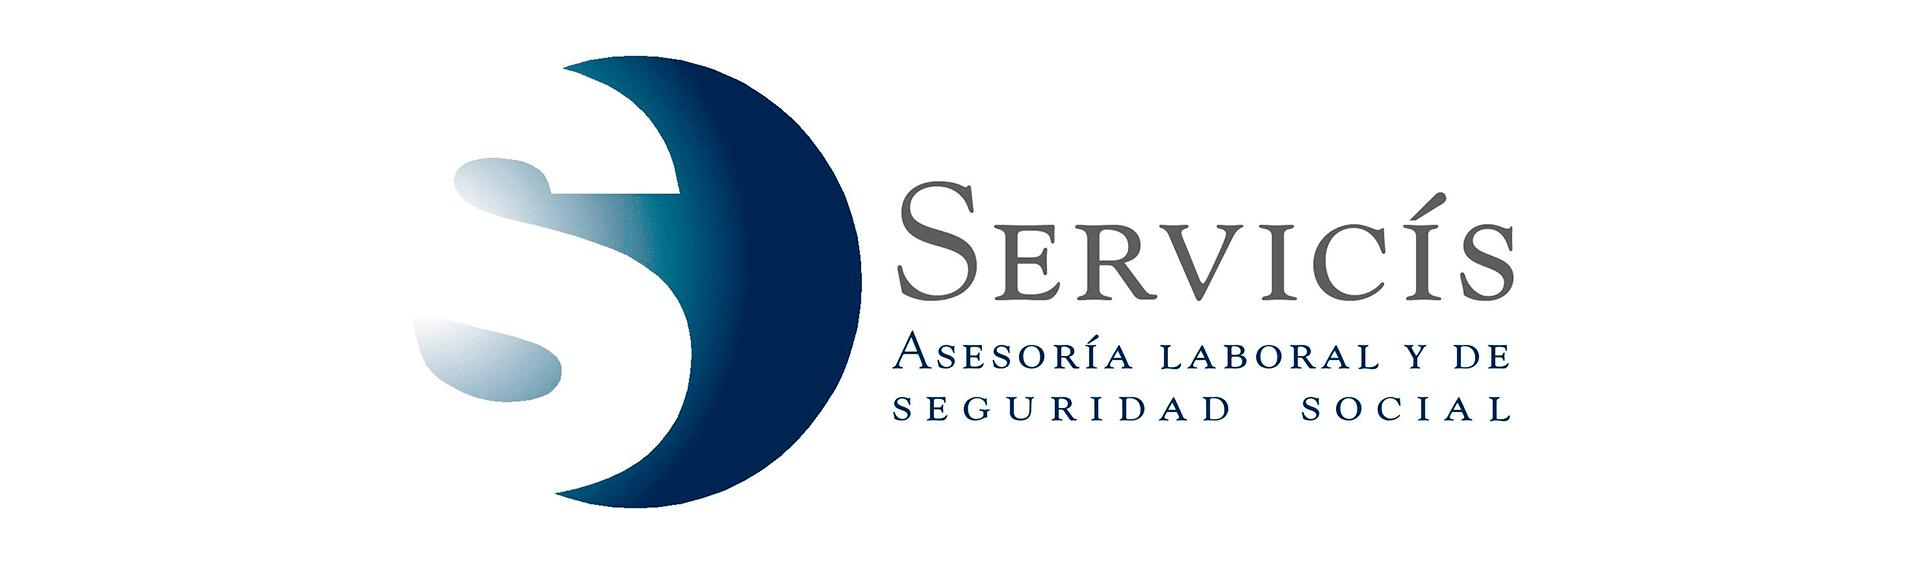 Servicis